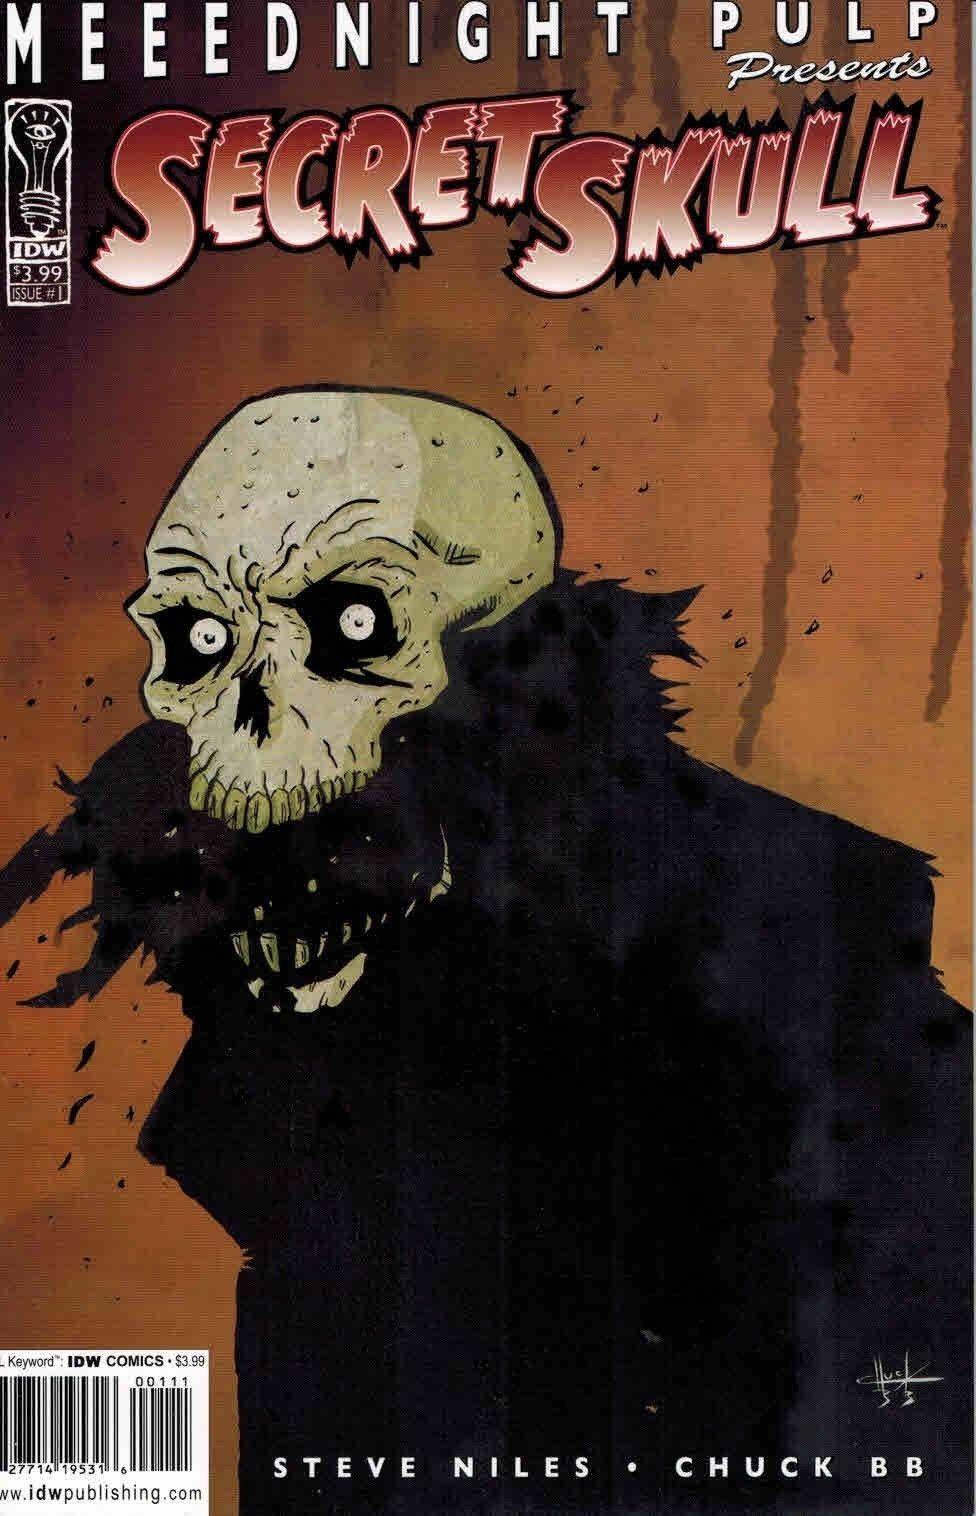 Meednight-Pulp-Presents-Secret-Skull-1-4-Complete-Set-Steve-Niles-Chuck-BB-310719981009.jpg